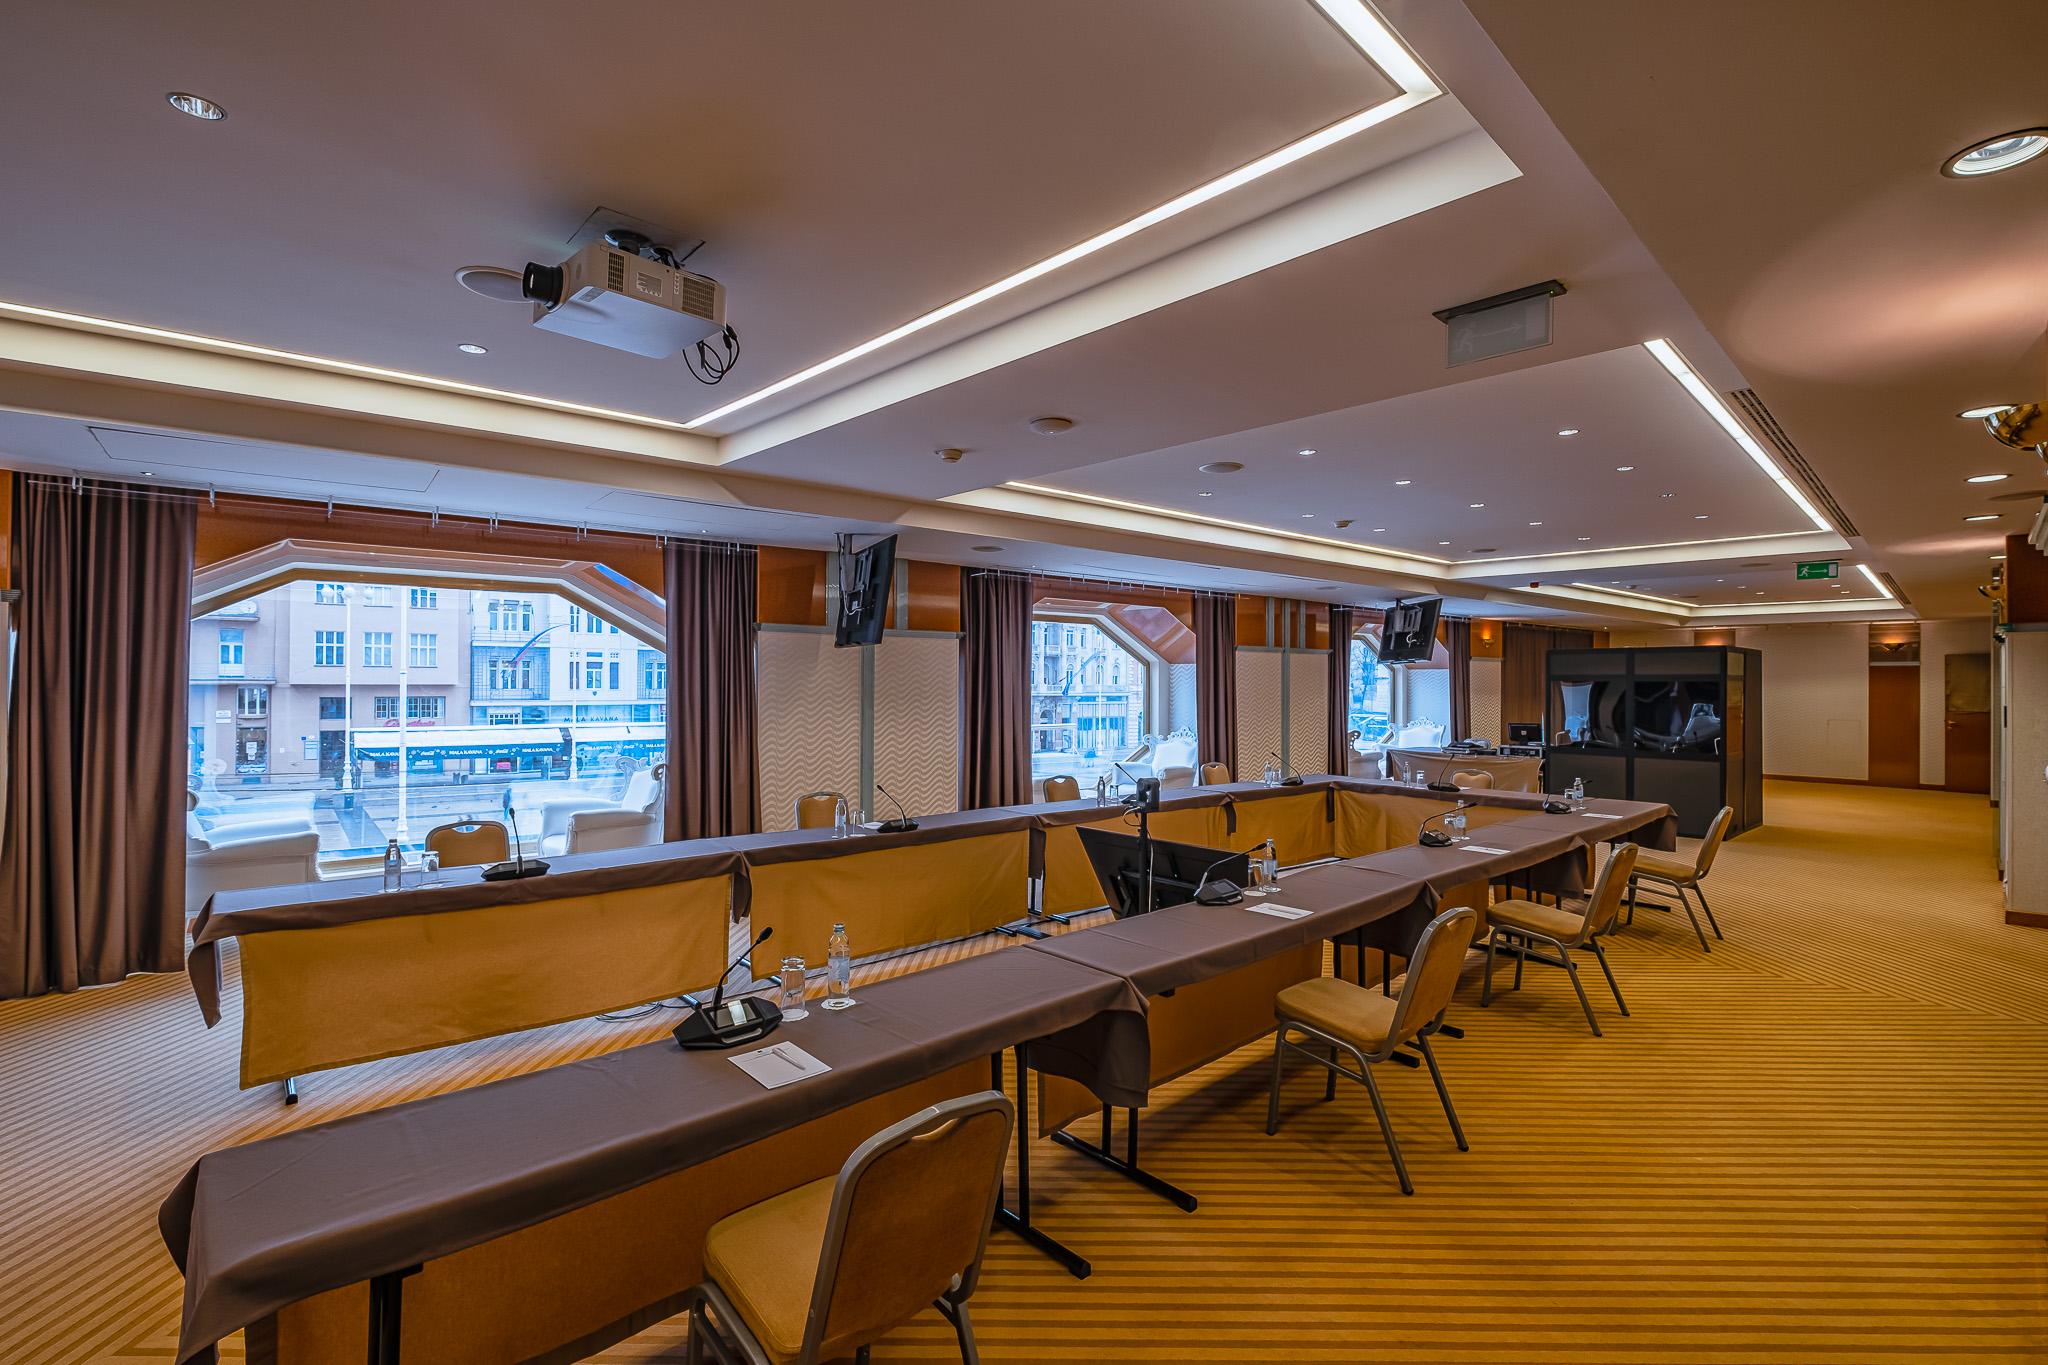 Hotel Dubrovnik conference Roman Martin 03